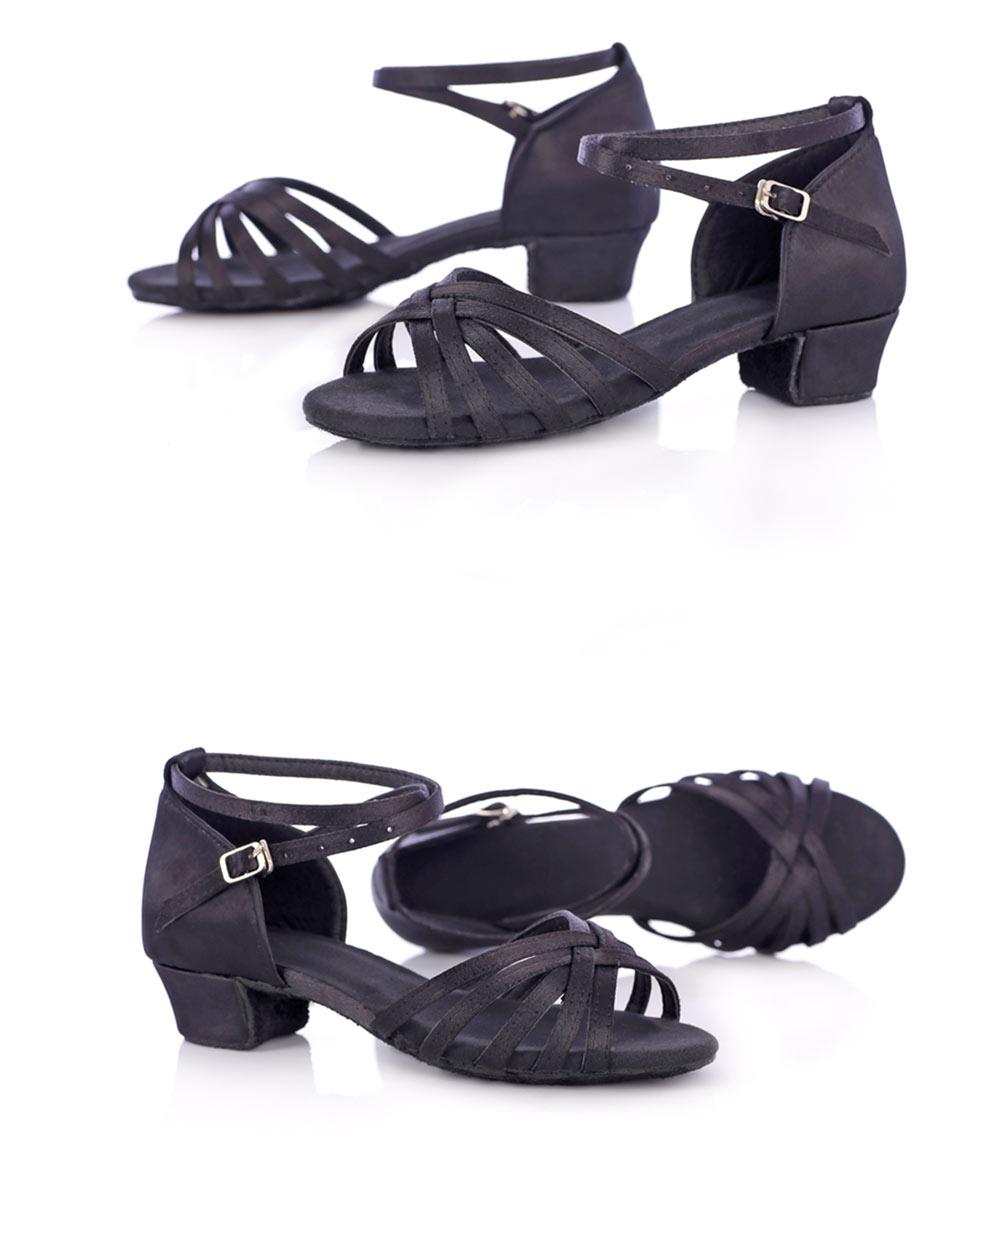 New Arrival Ballroom Tango Latin Dance Shoes High Quality Latin Woman Dancing Shoe Wholesale Women'S Heel Shoes Fast Shipping (8)